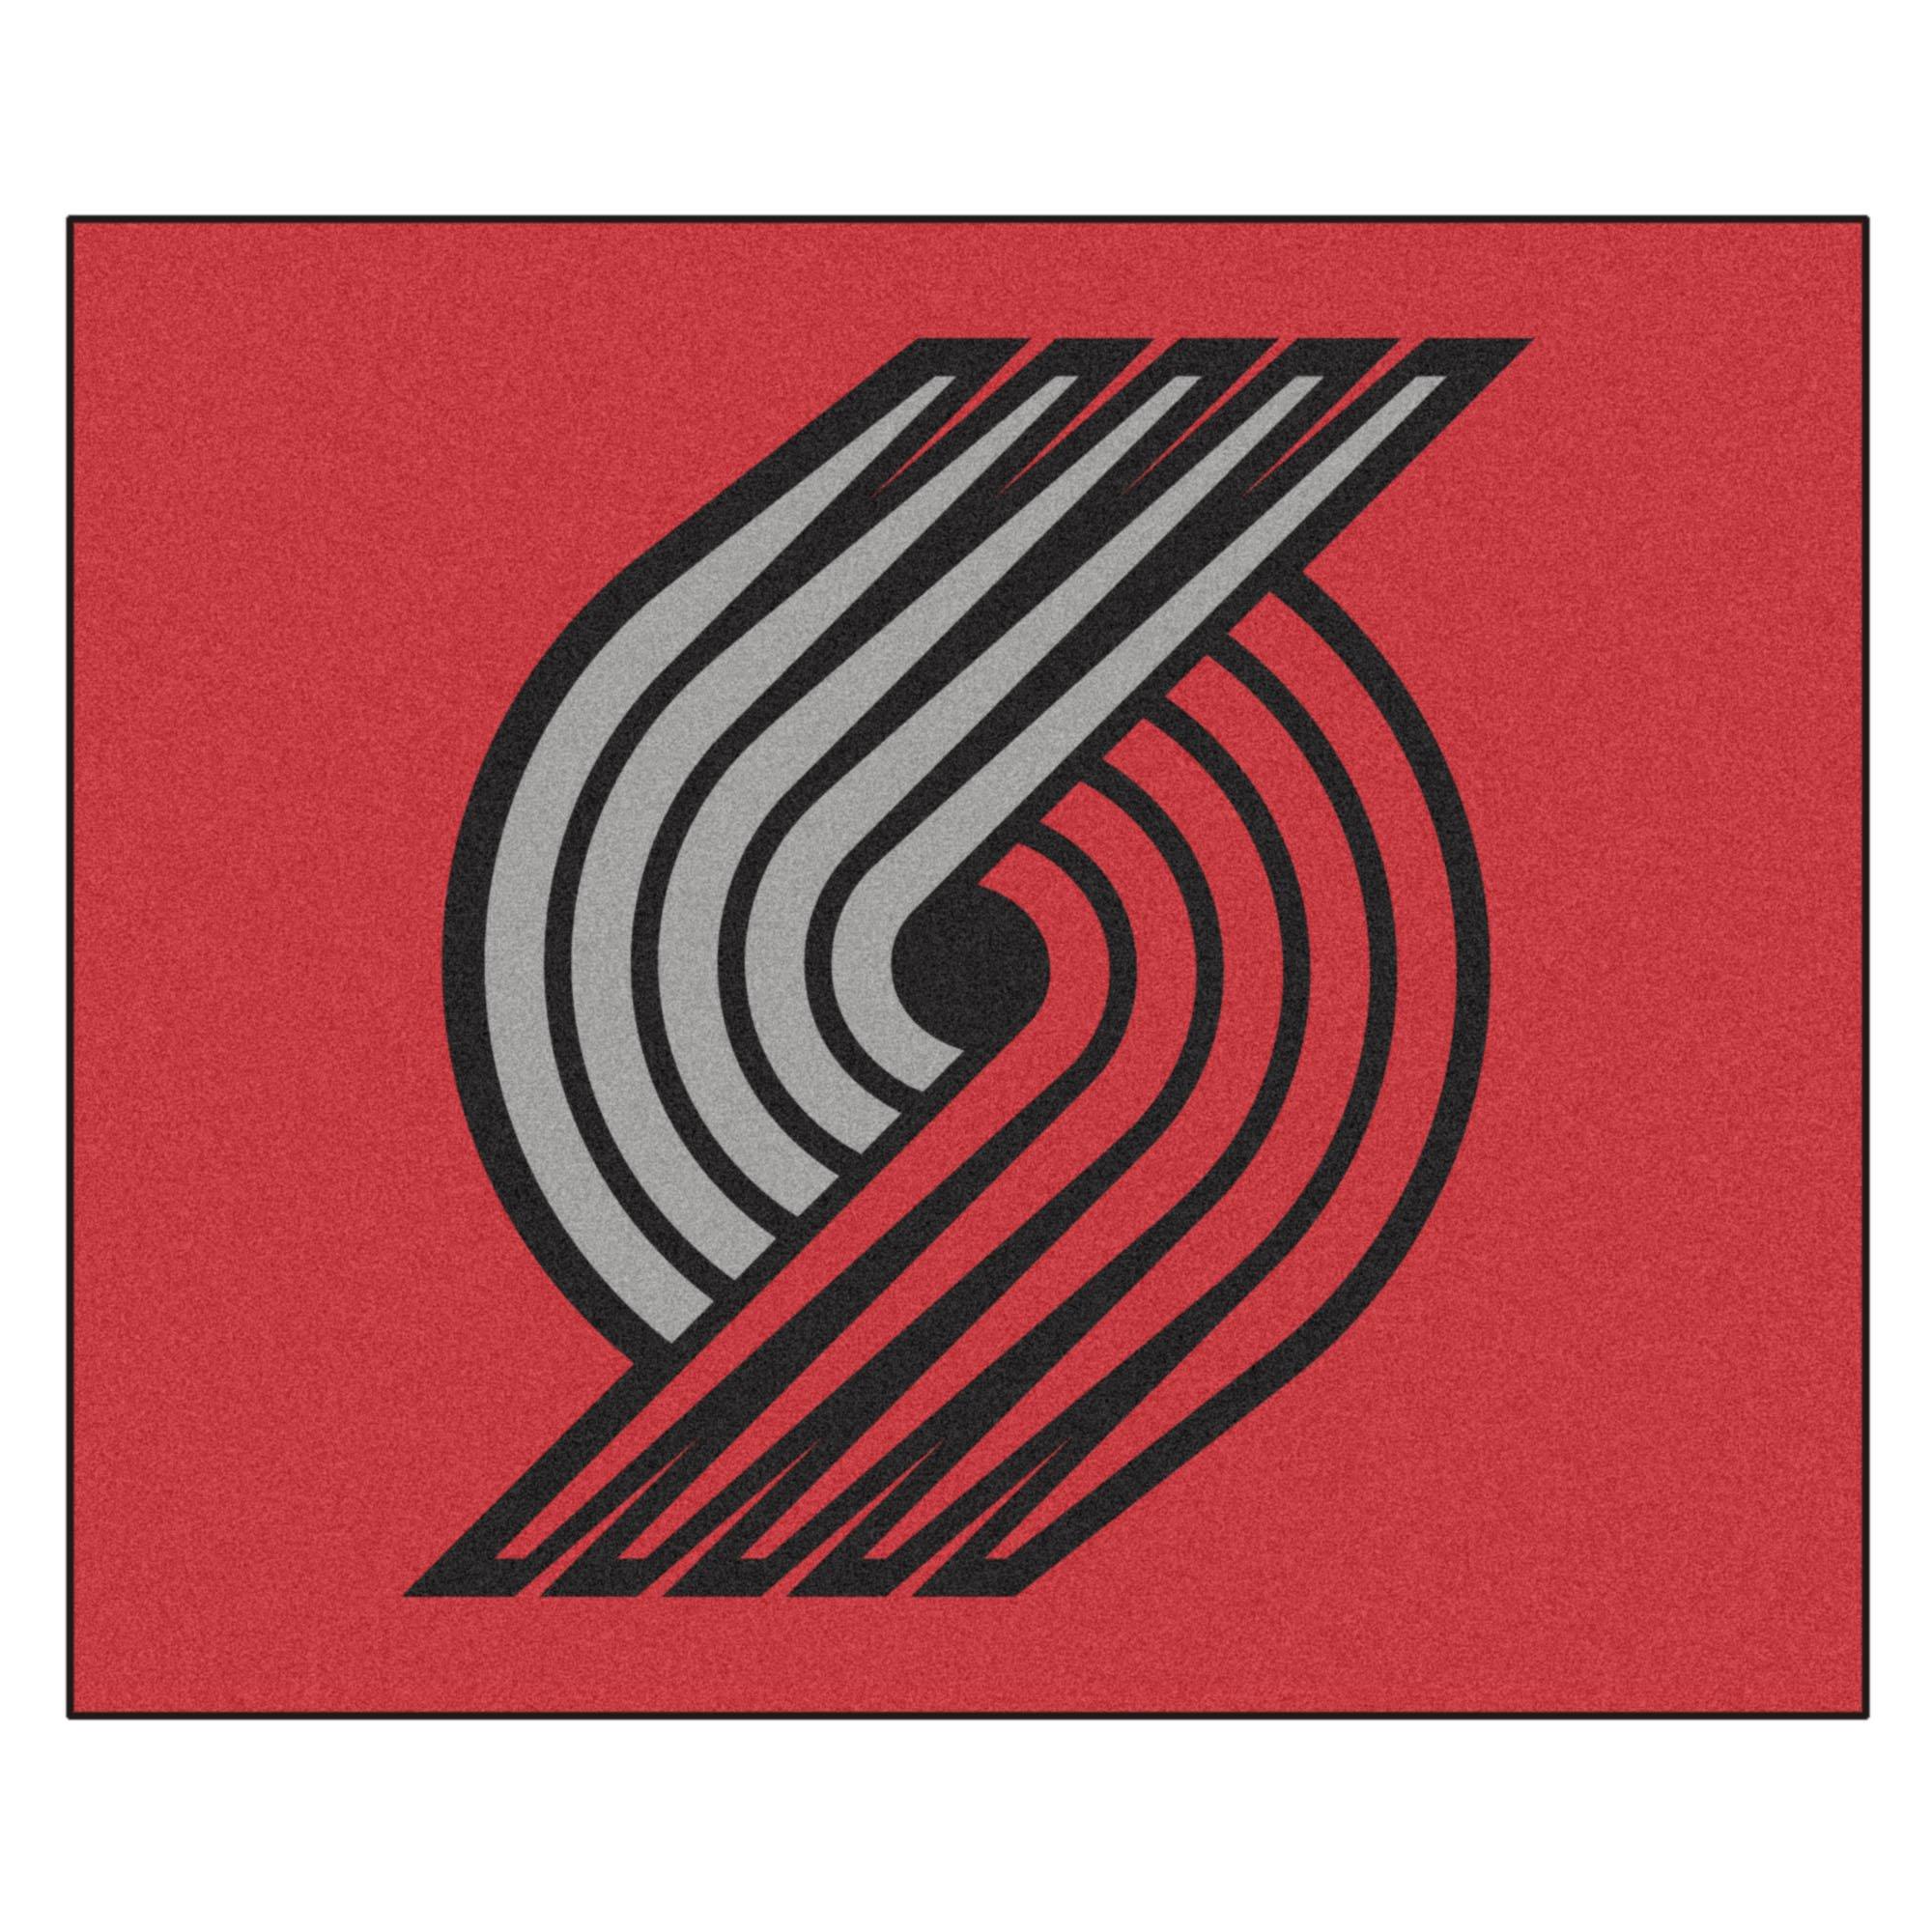 FANMATS 19472 NBA - Portland Trail Blazers Tailgater Rug , Team Color, 59.5''x71''